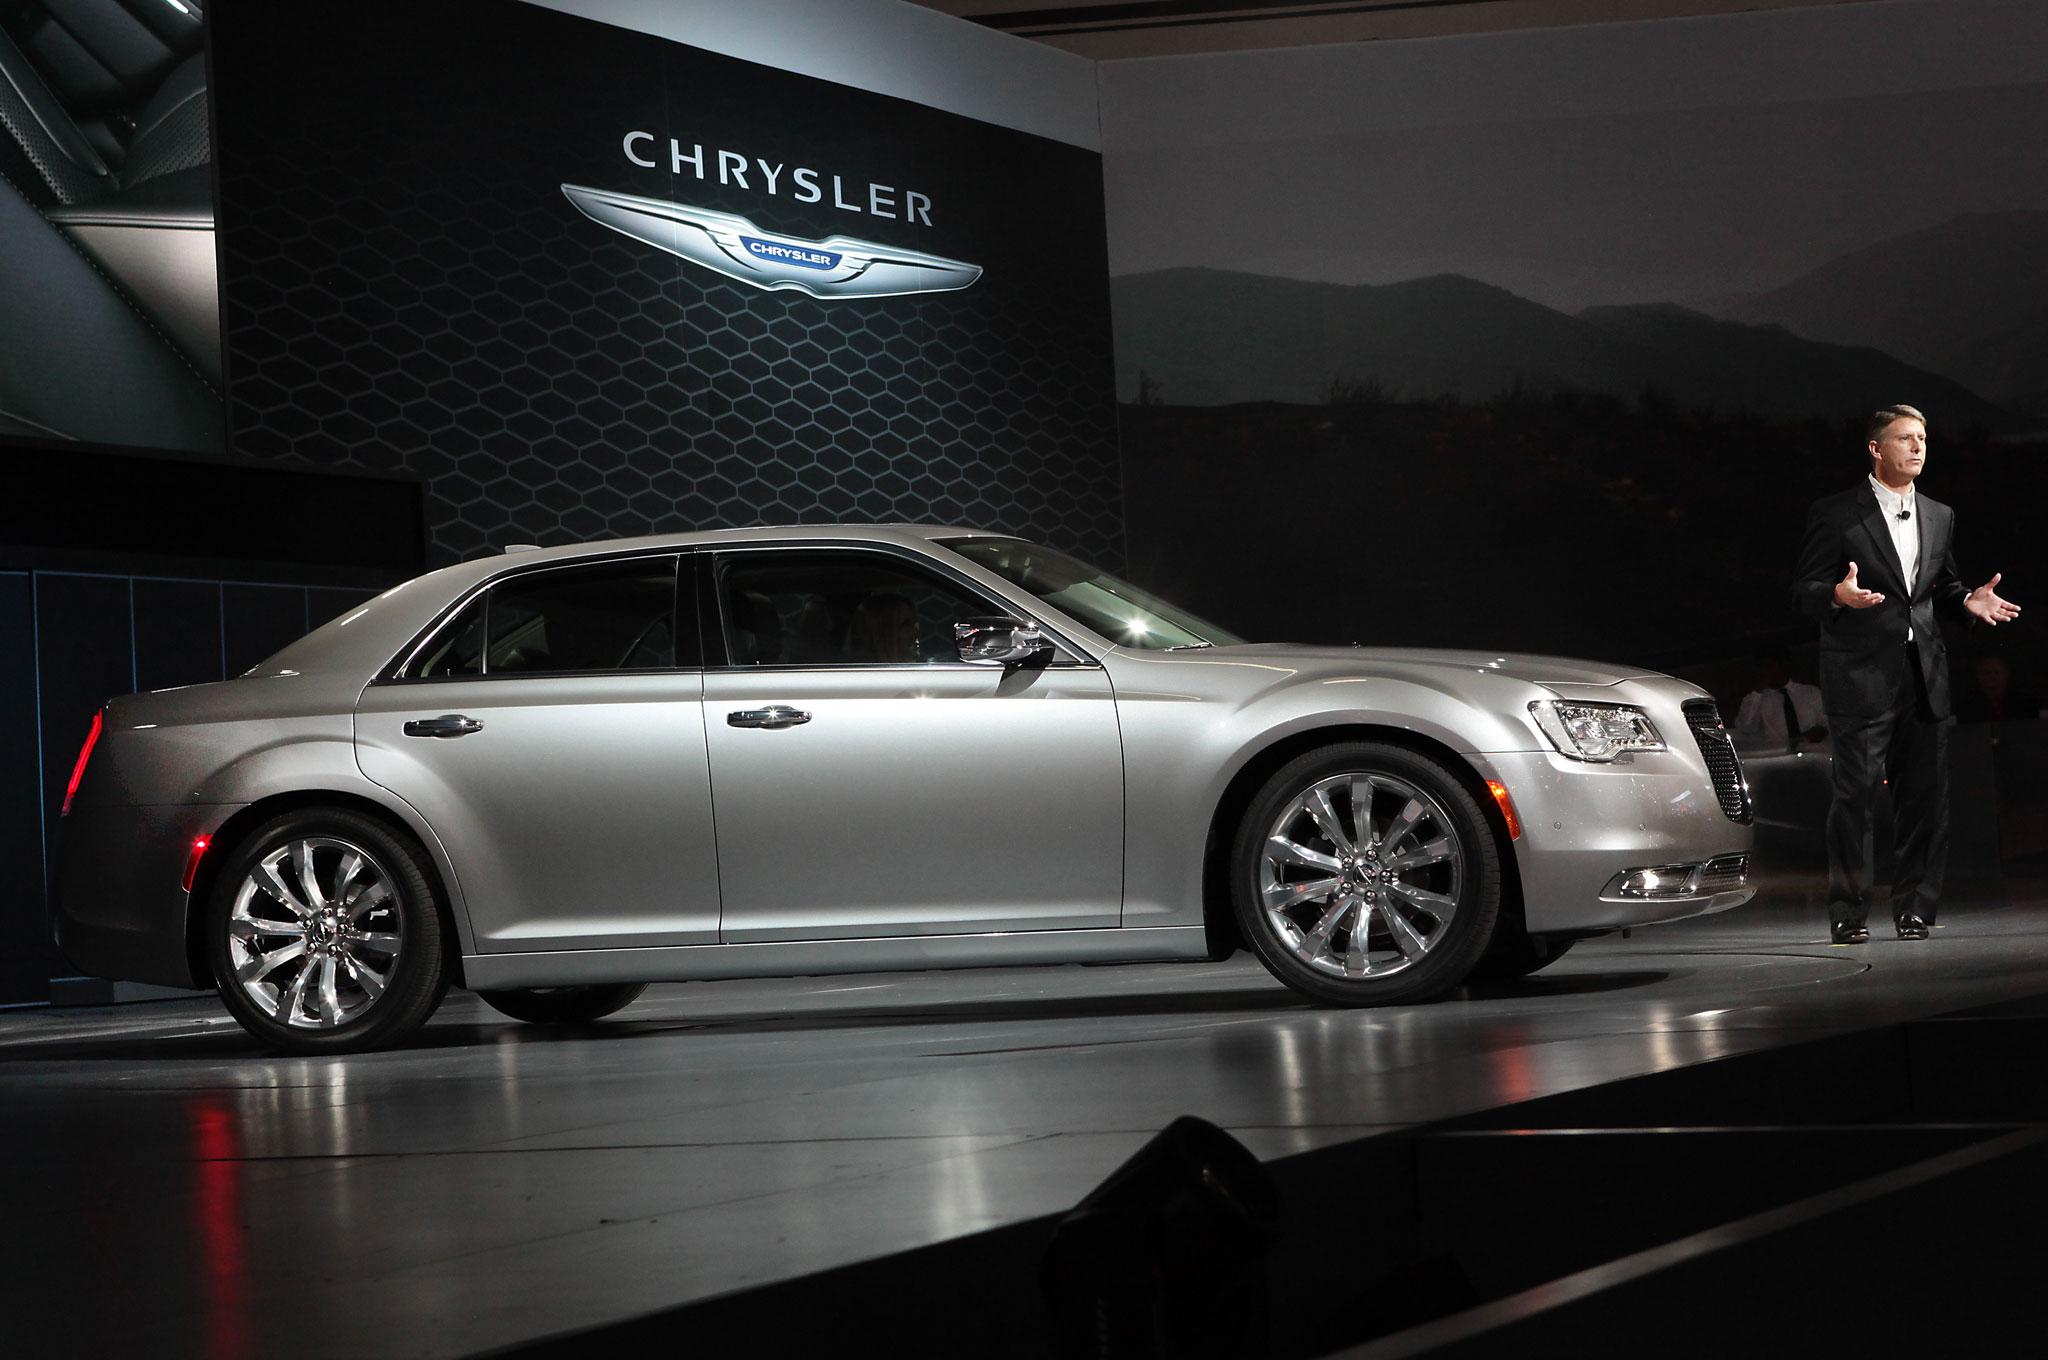 width chrysler height content articles cars com meta review itemprop news